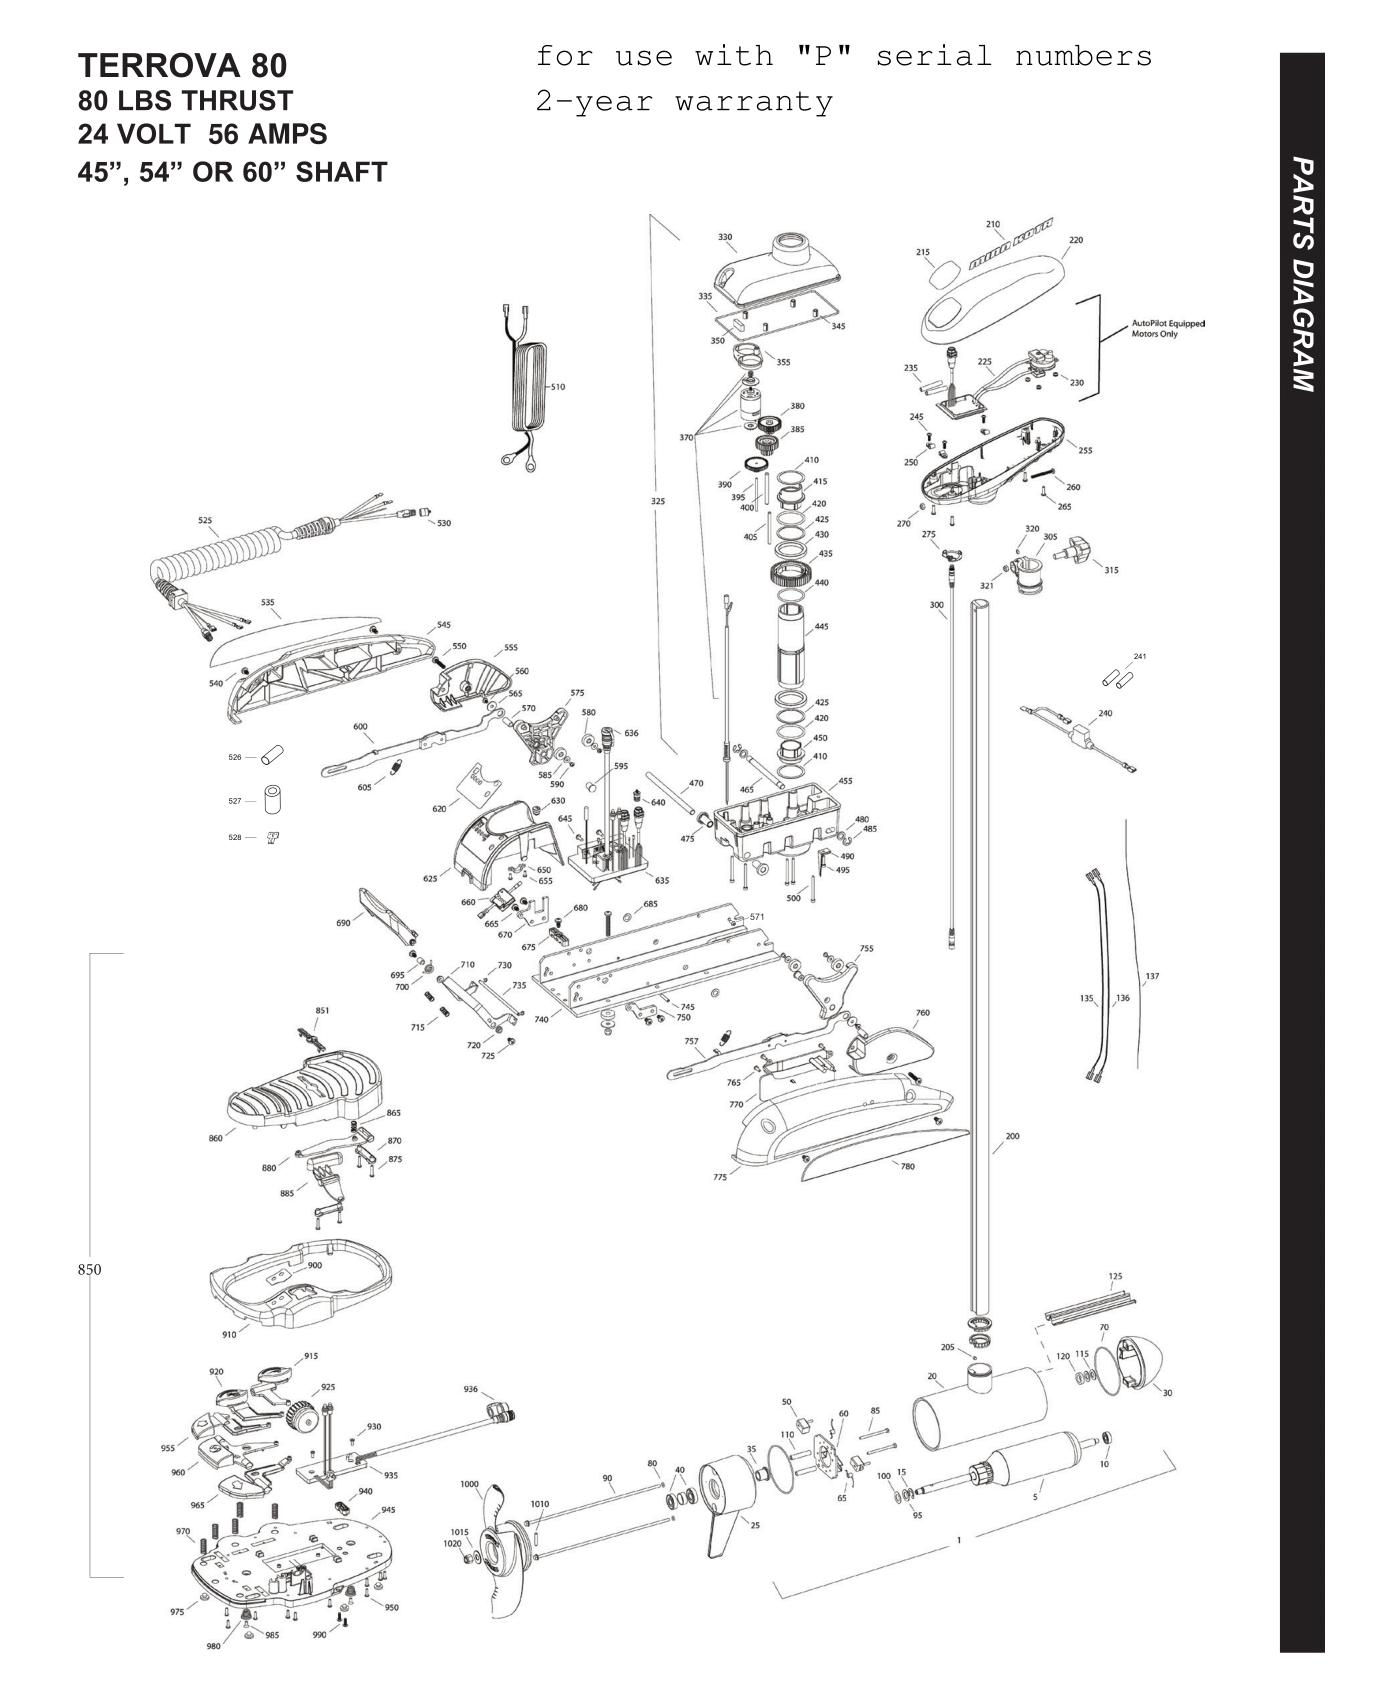 2015-mk-terrova80-1 png